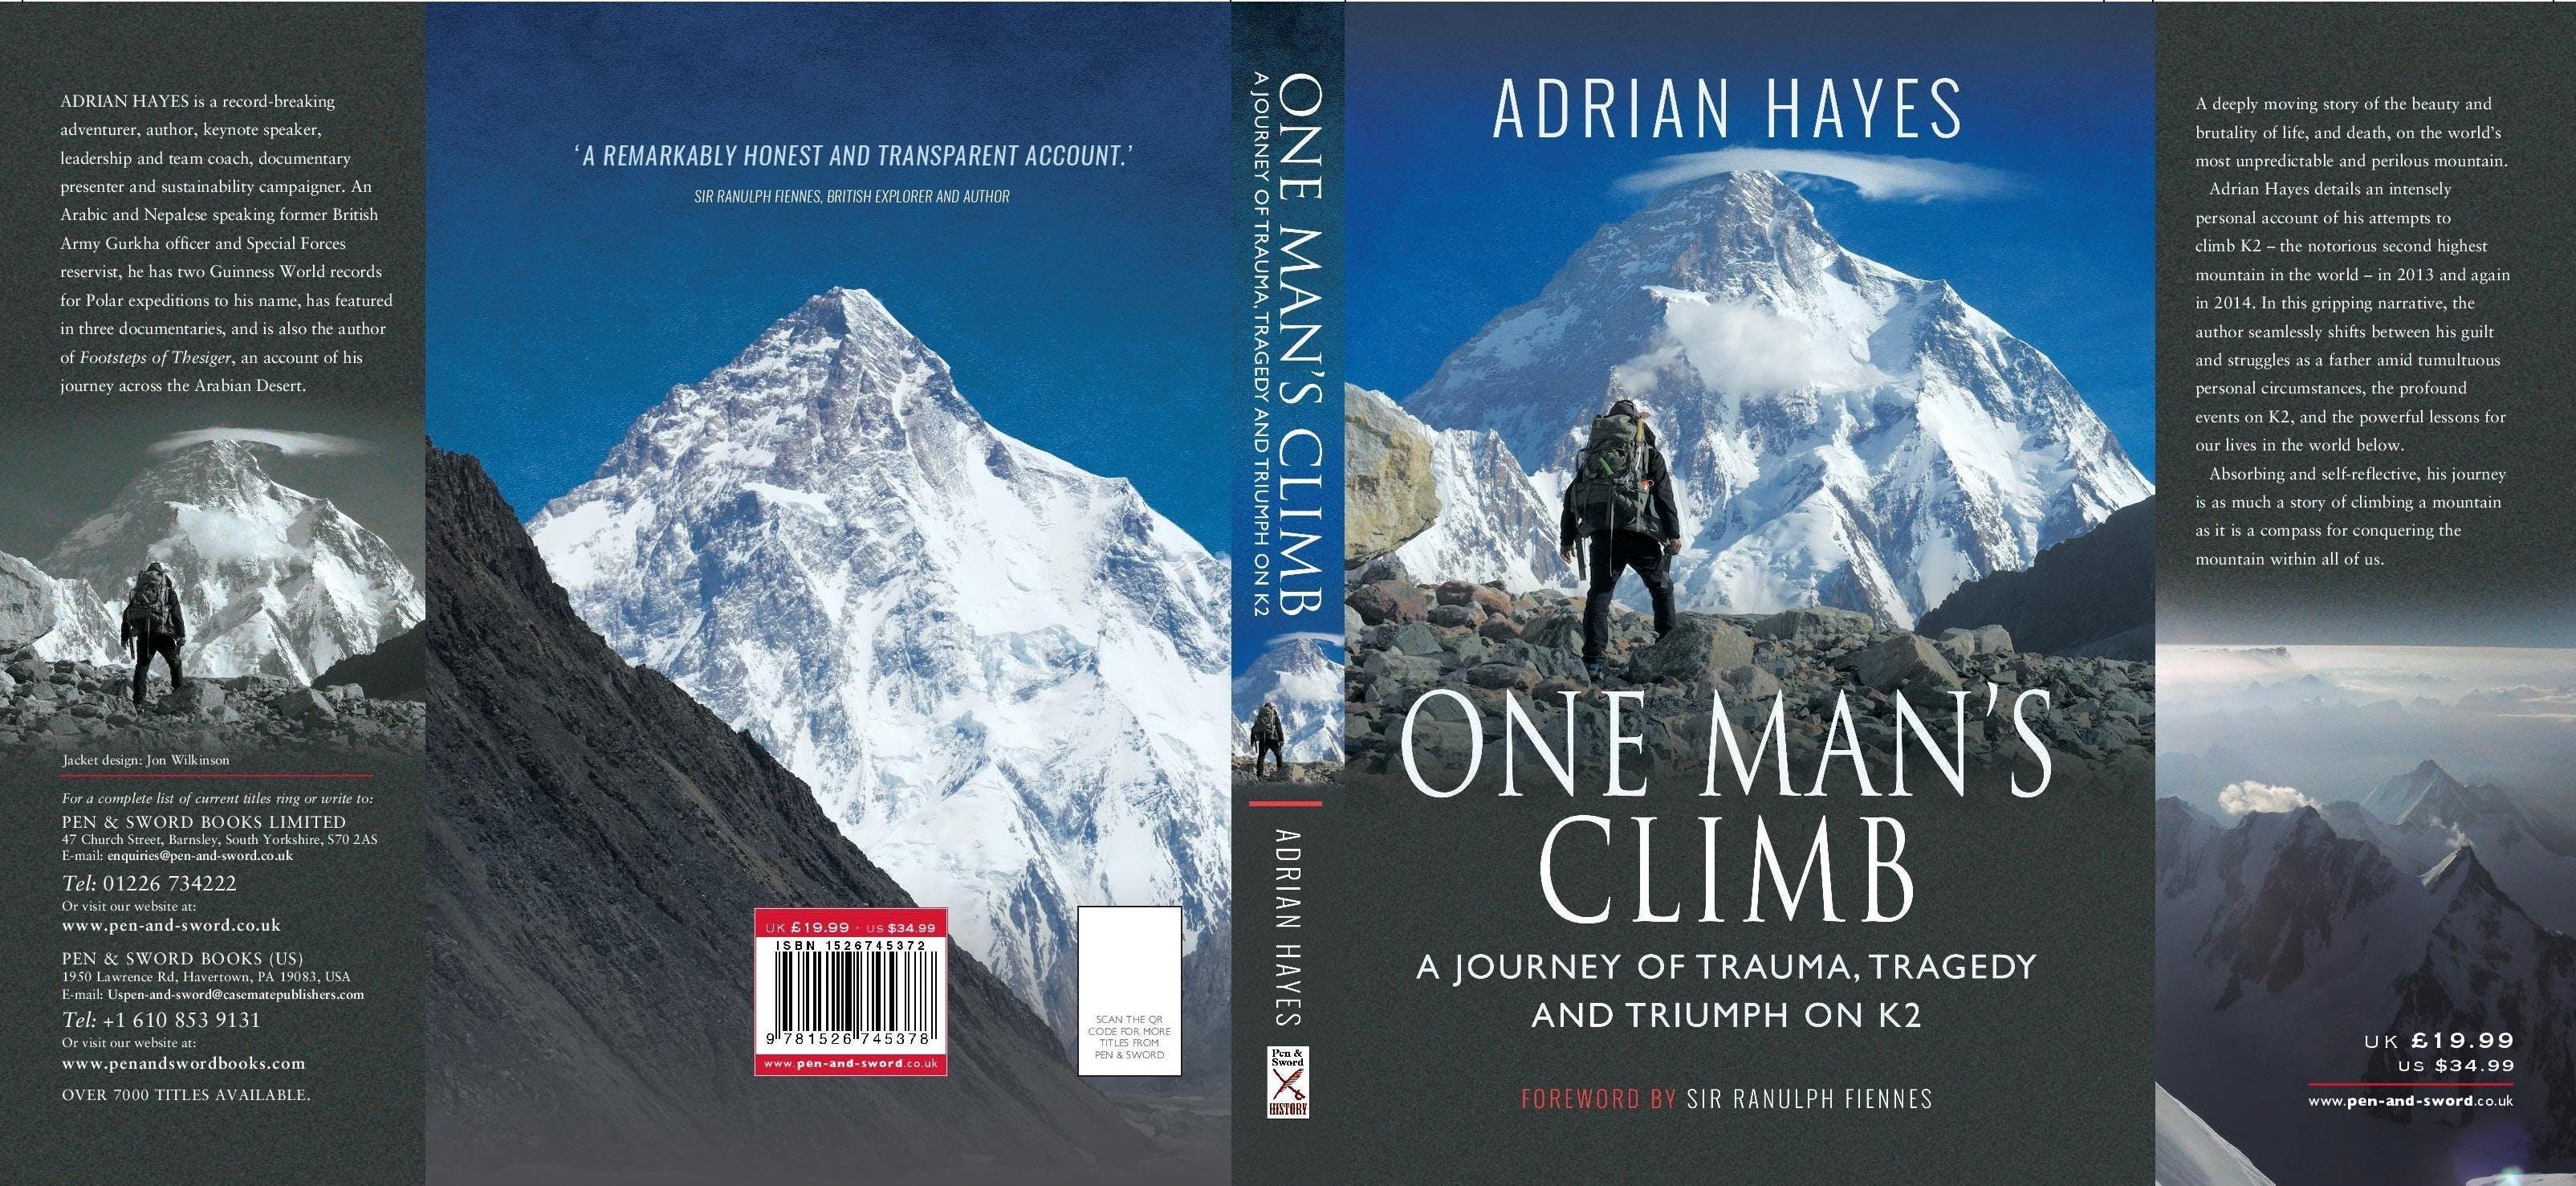 'One Man's Climb' Book Launch and Presentatio